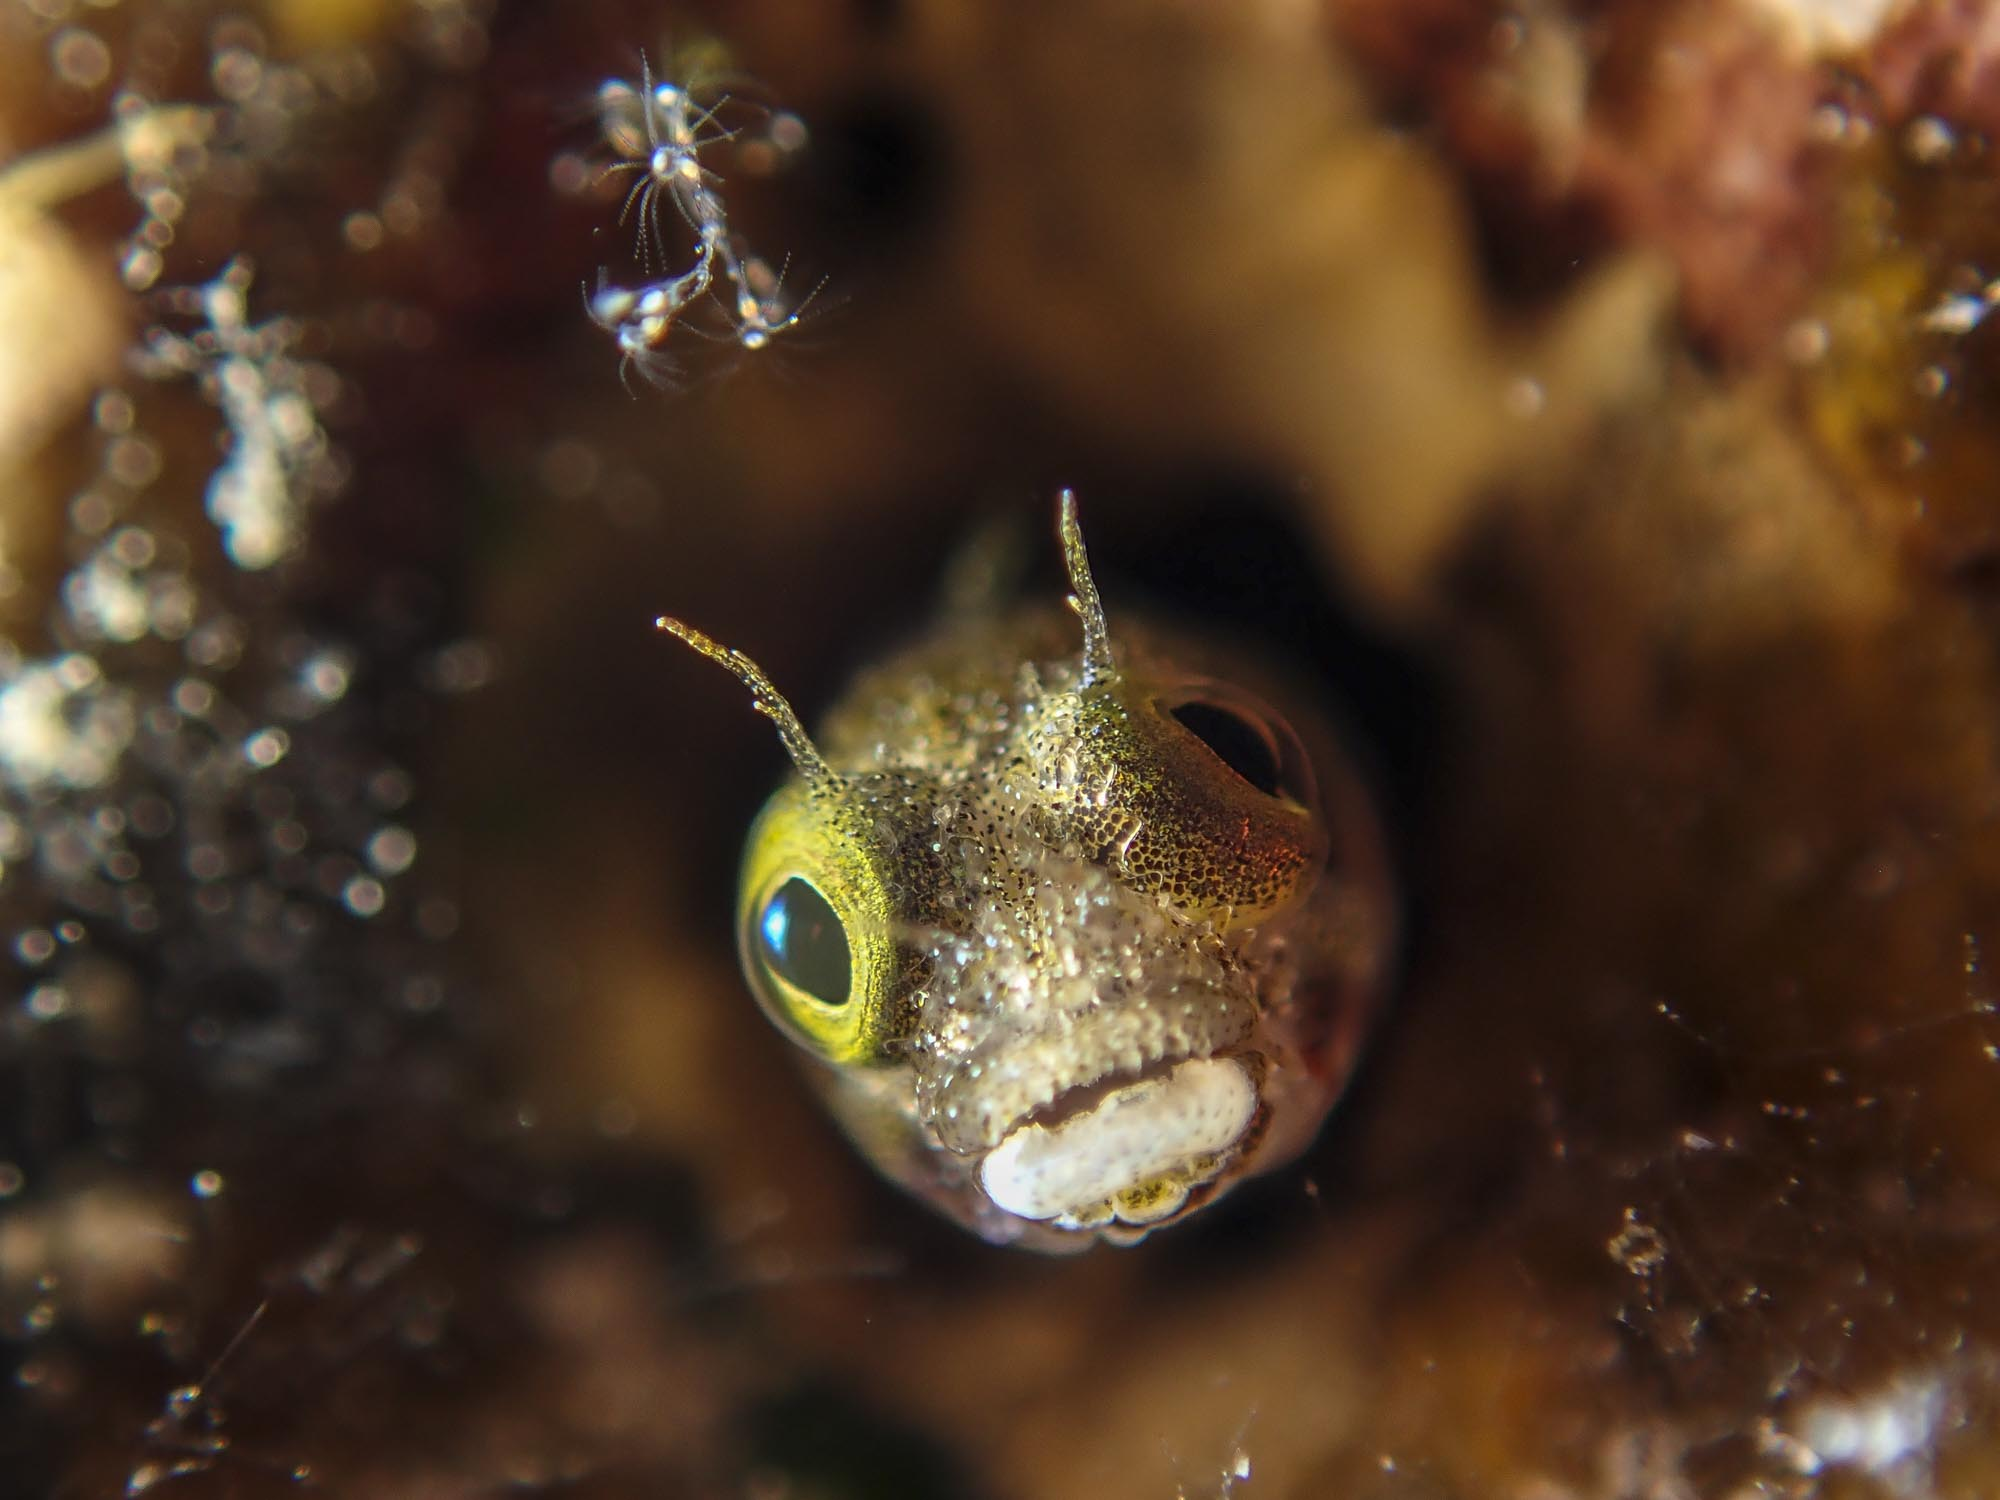 Olympus Tough Tg 5 Underwater Review The Digital Shootout Black Kamera Read